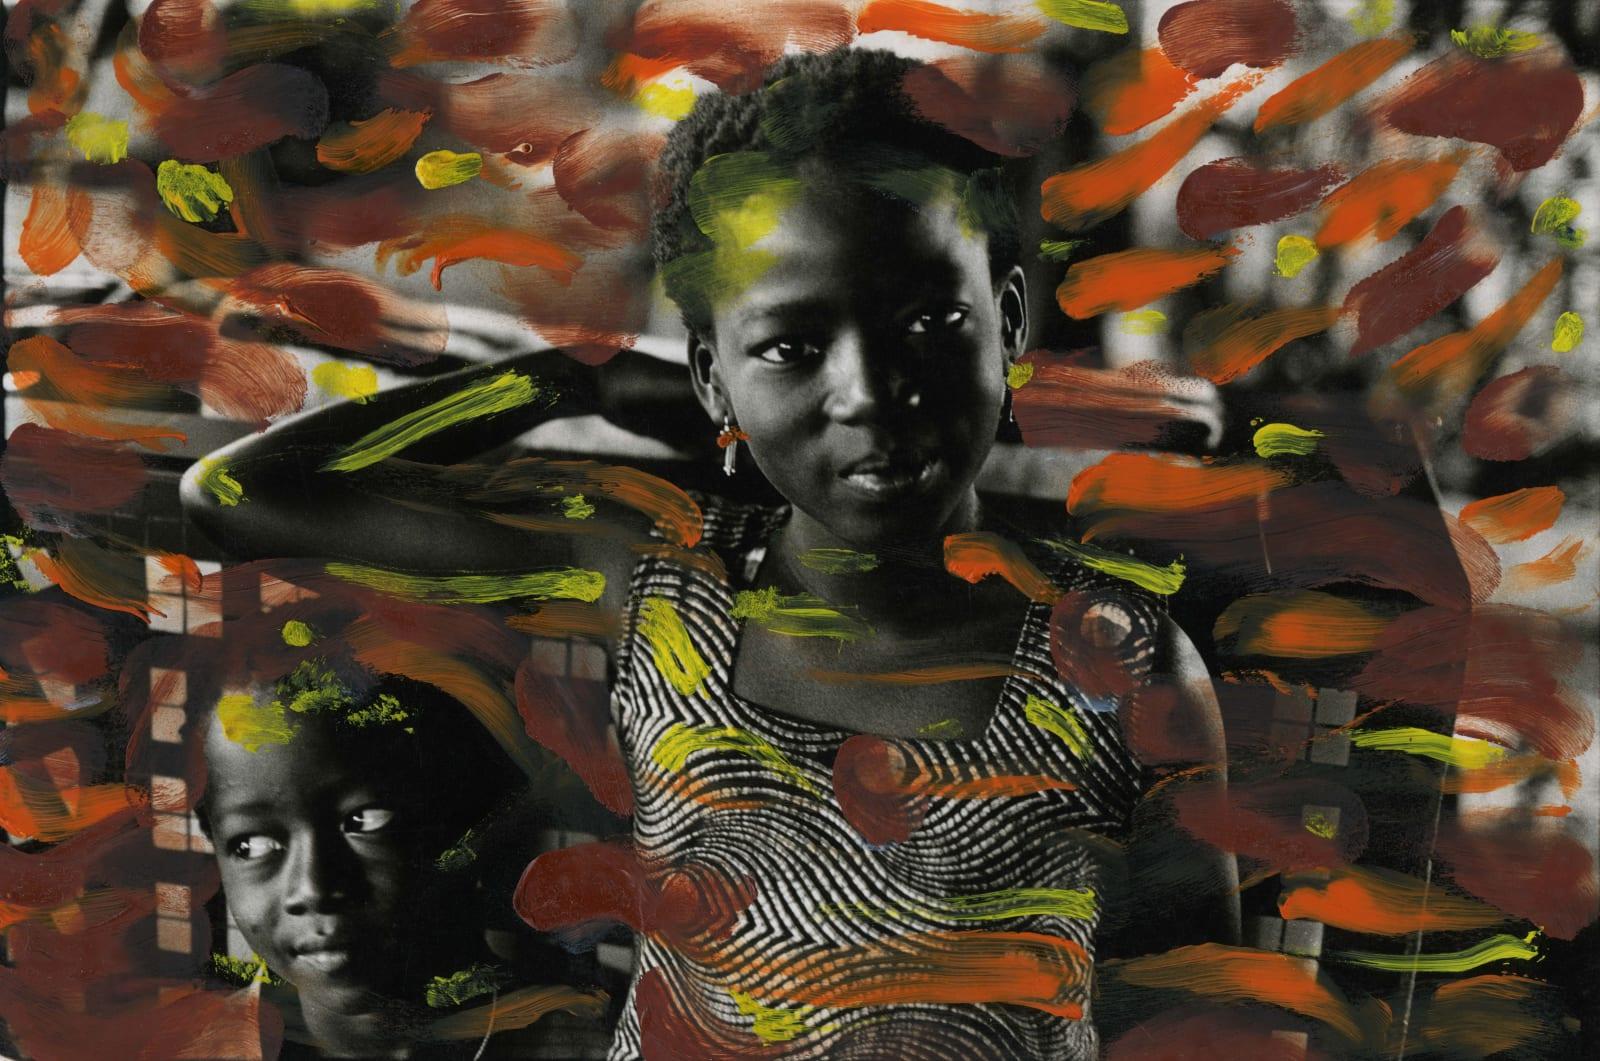 Ming Smith, Abidjan Children, 1972, 2003